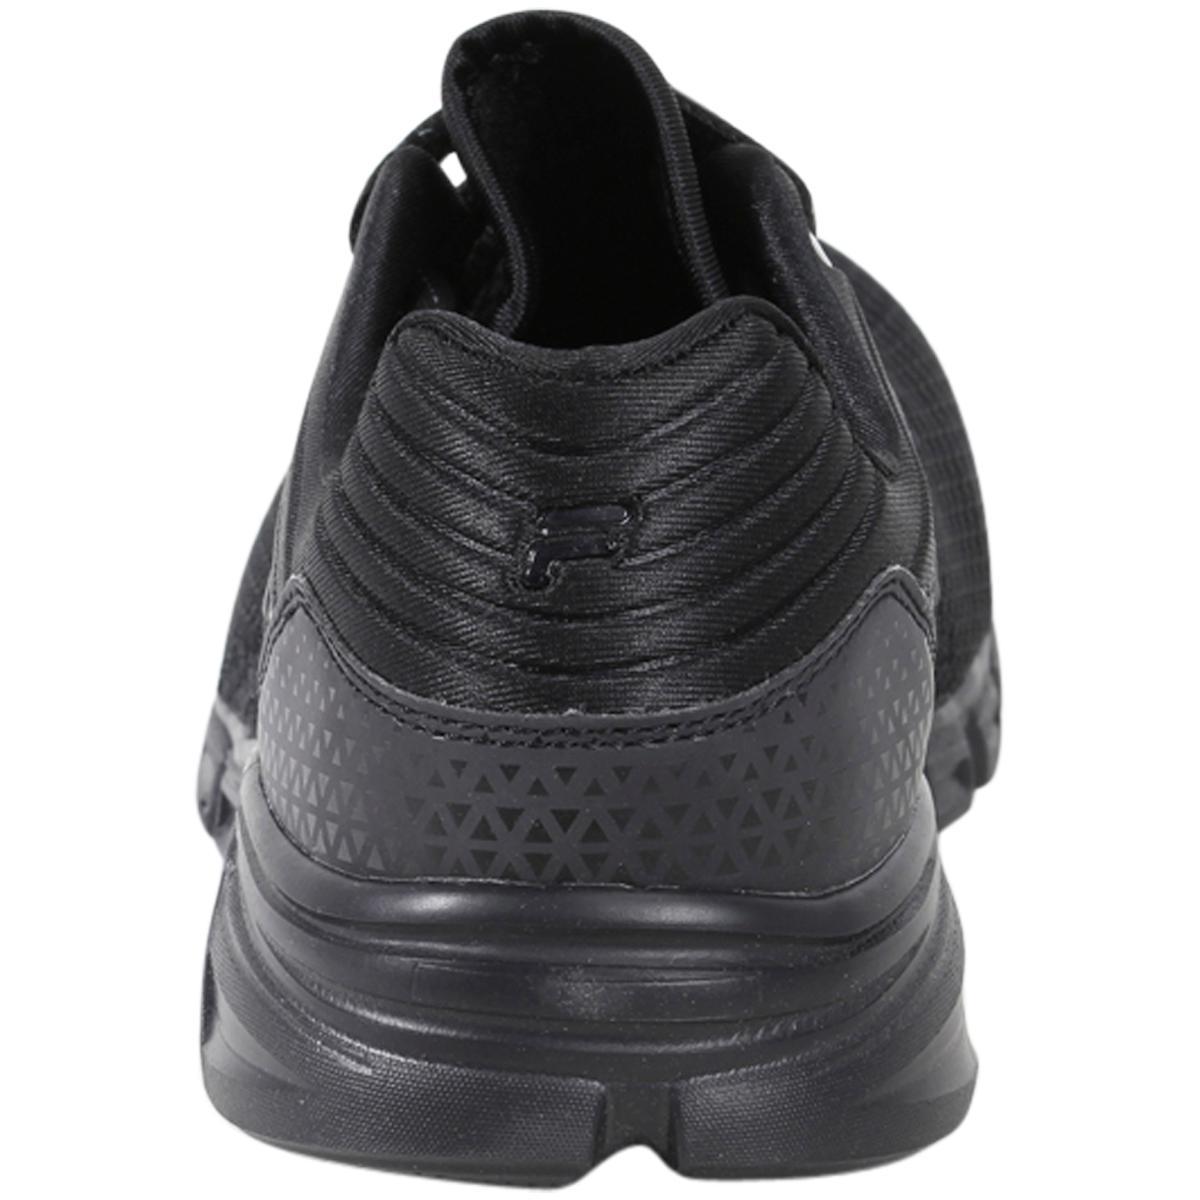 335e88f2d513 Fila Men s Memory-Multiswift-2 Memory Foam Running Sneakers Shoes